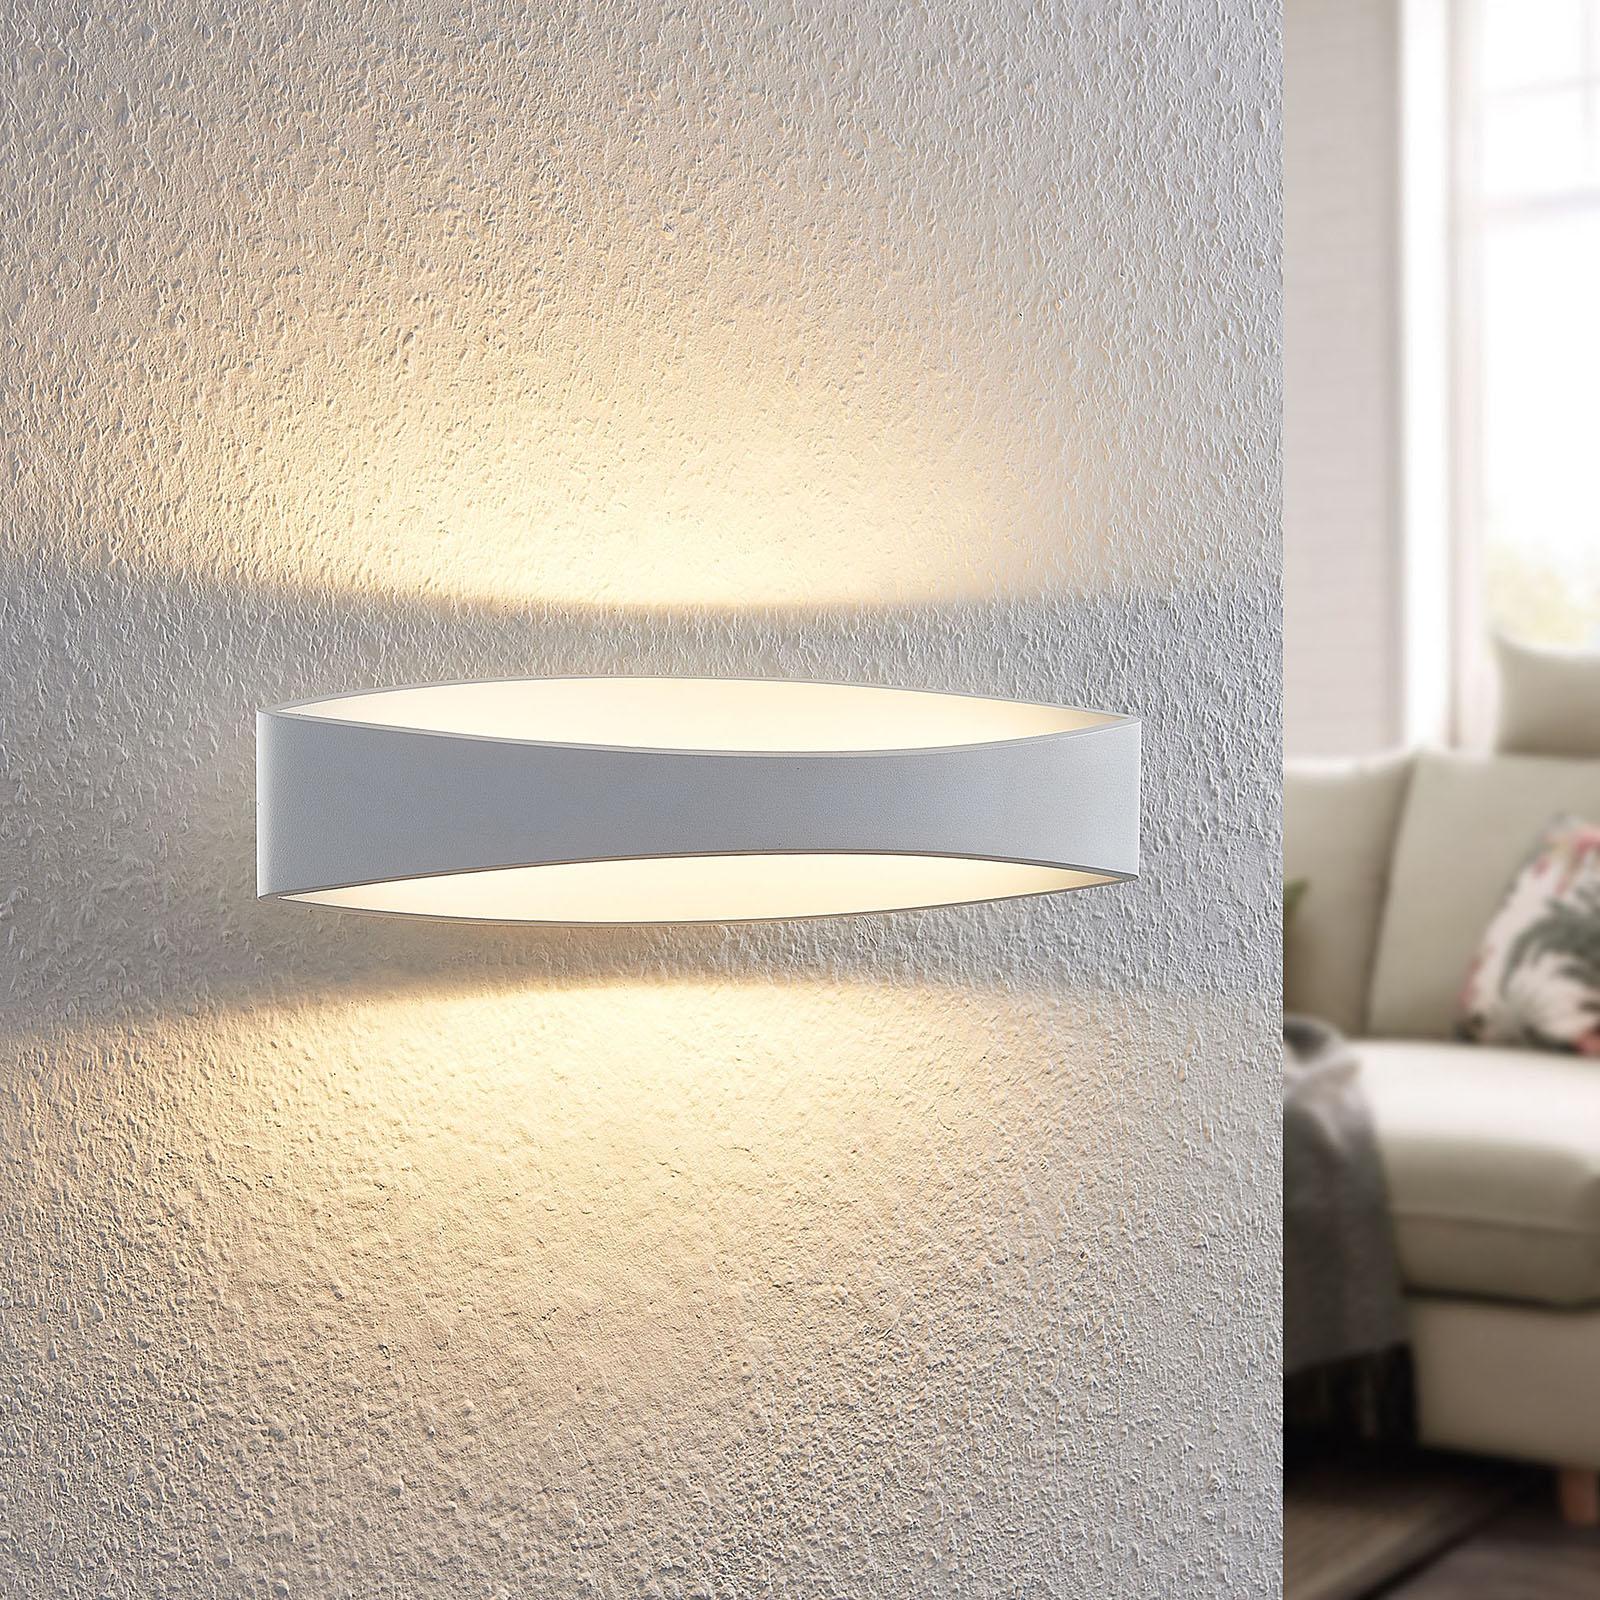 Arcchio Jelle LED-vegglampe, 43,5 cm, hvit